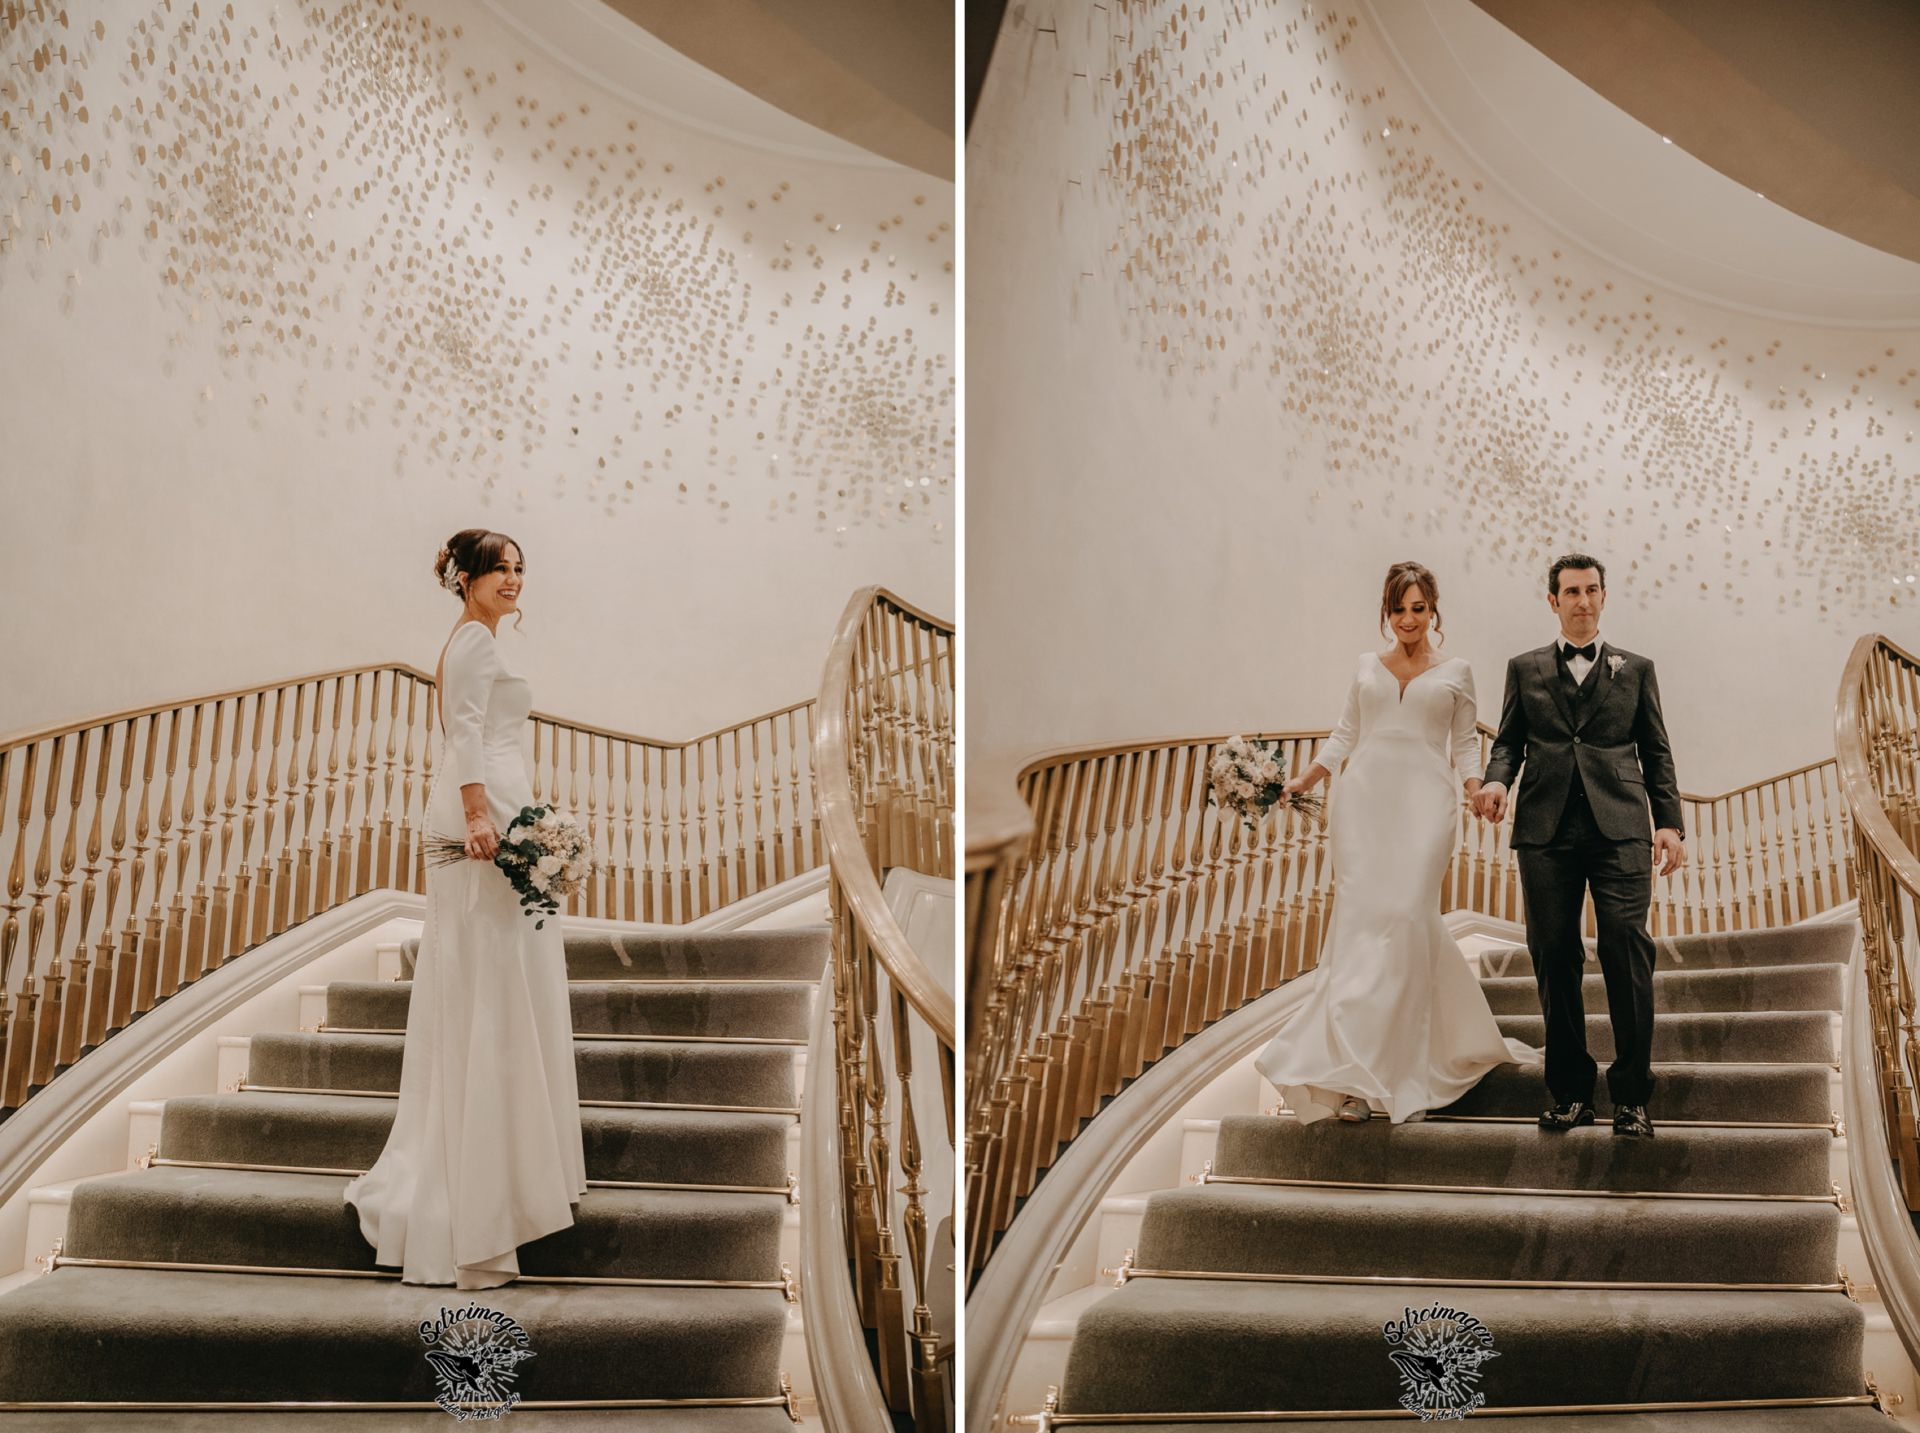 Fotógrafo de bodas en el Hotel Four Seasons Madrid